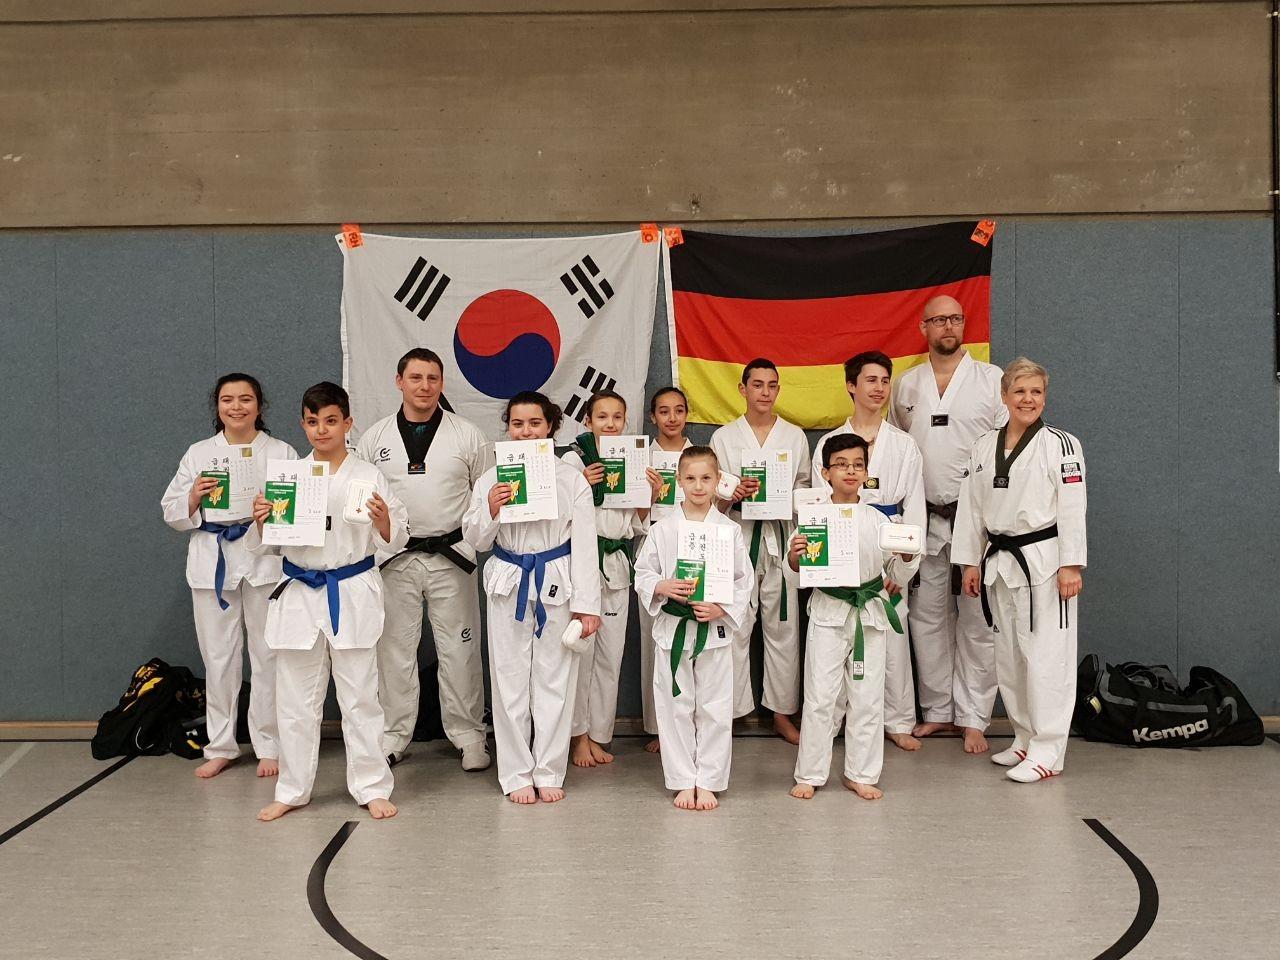 JCR-pruefung-jugendliche-2018-taekwondo